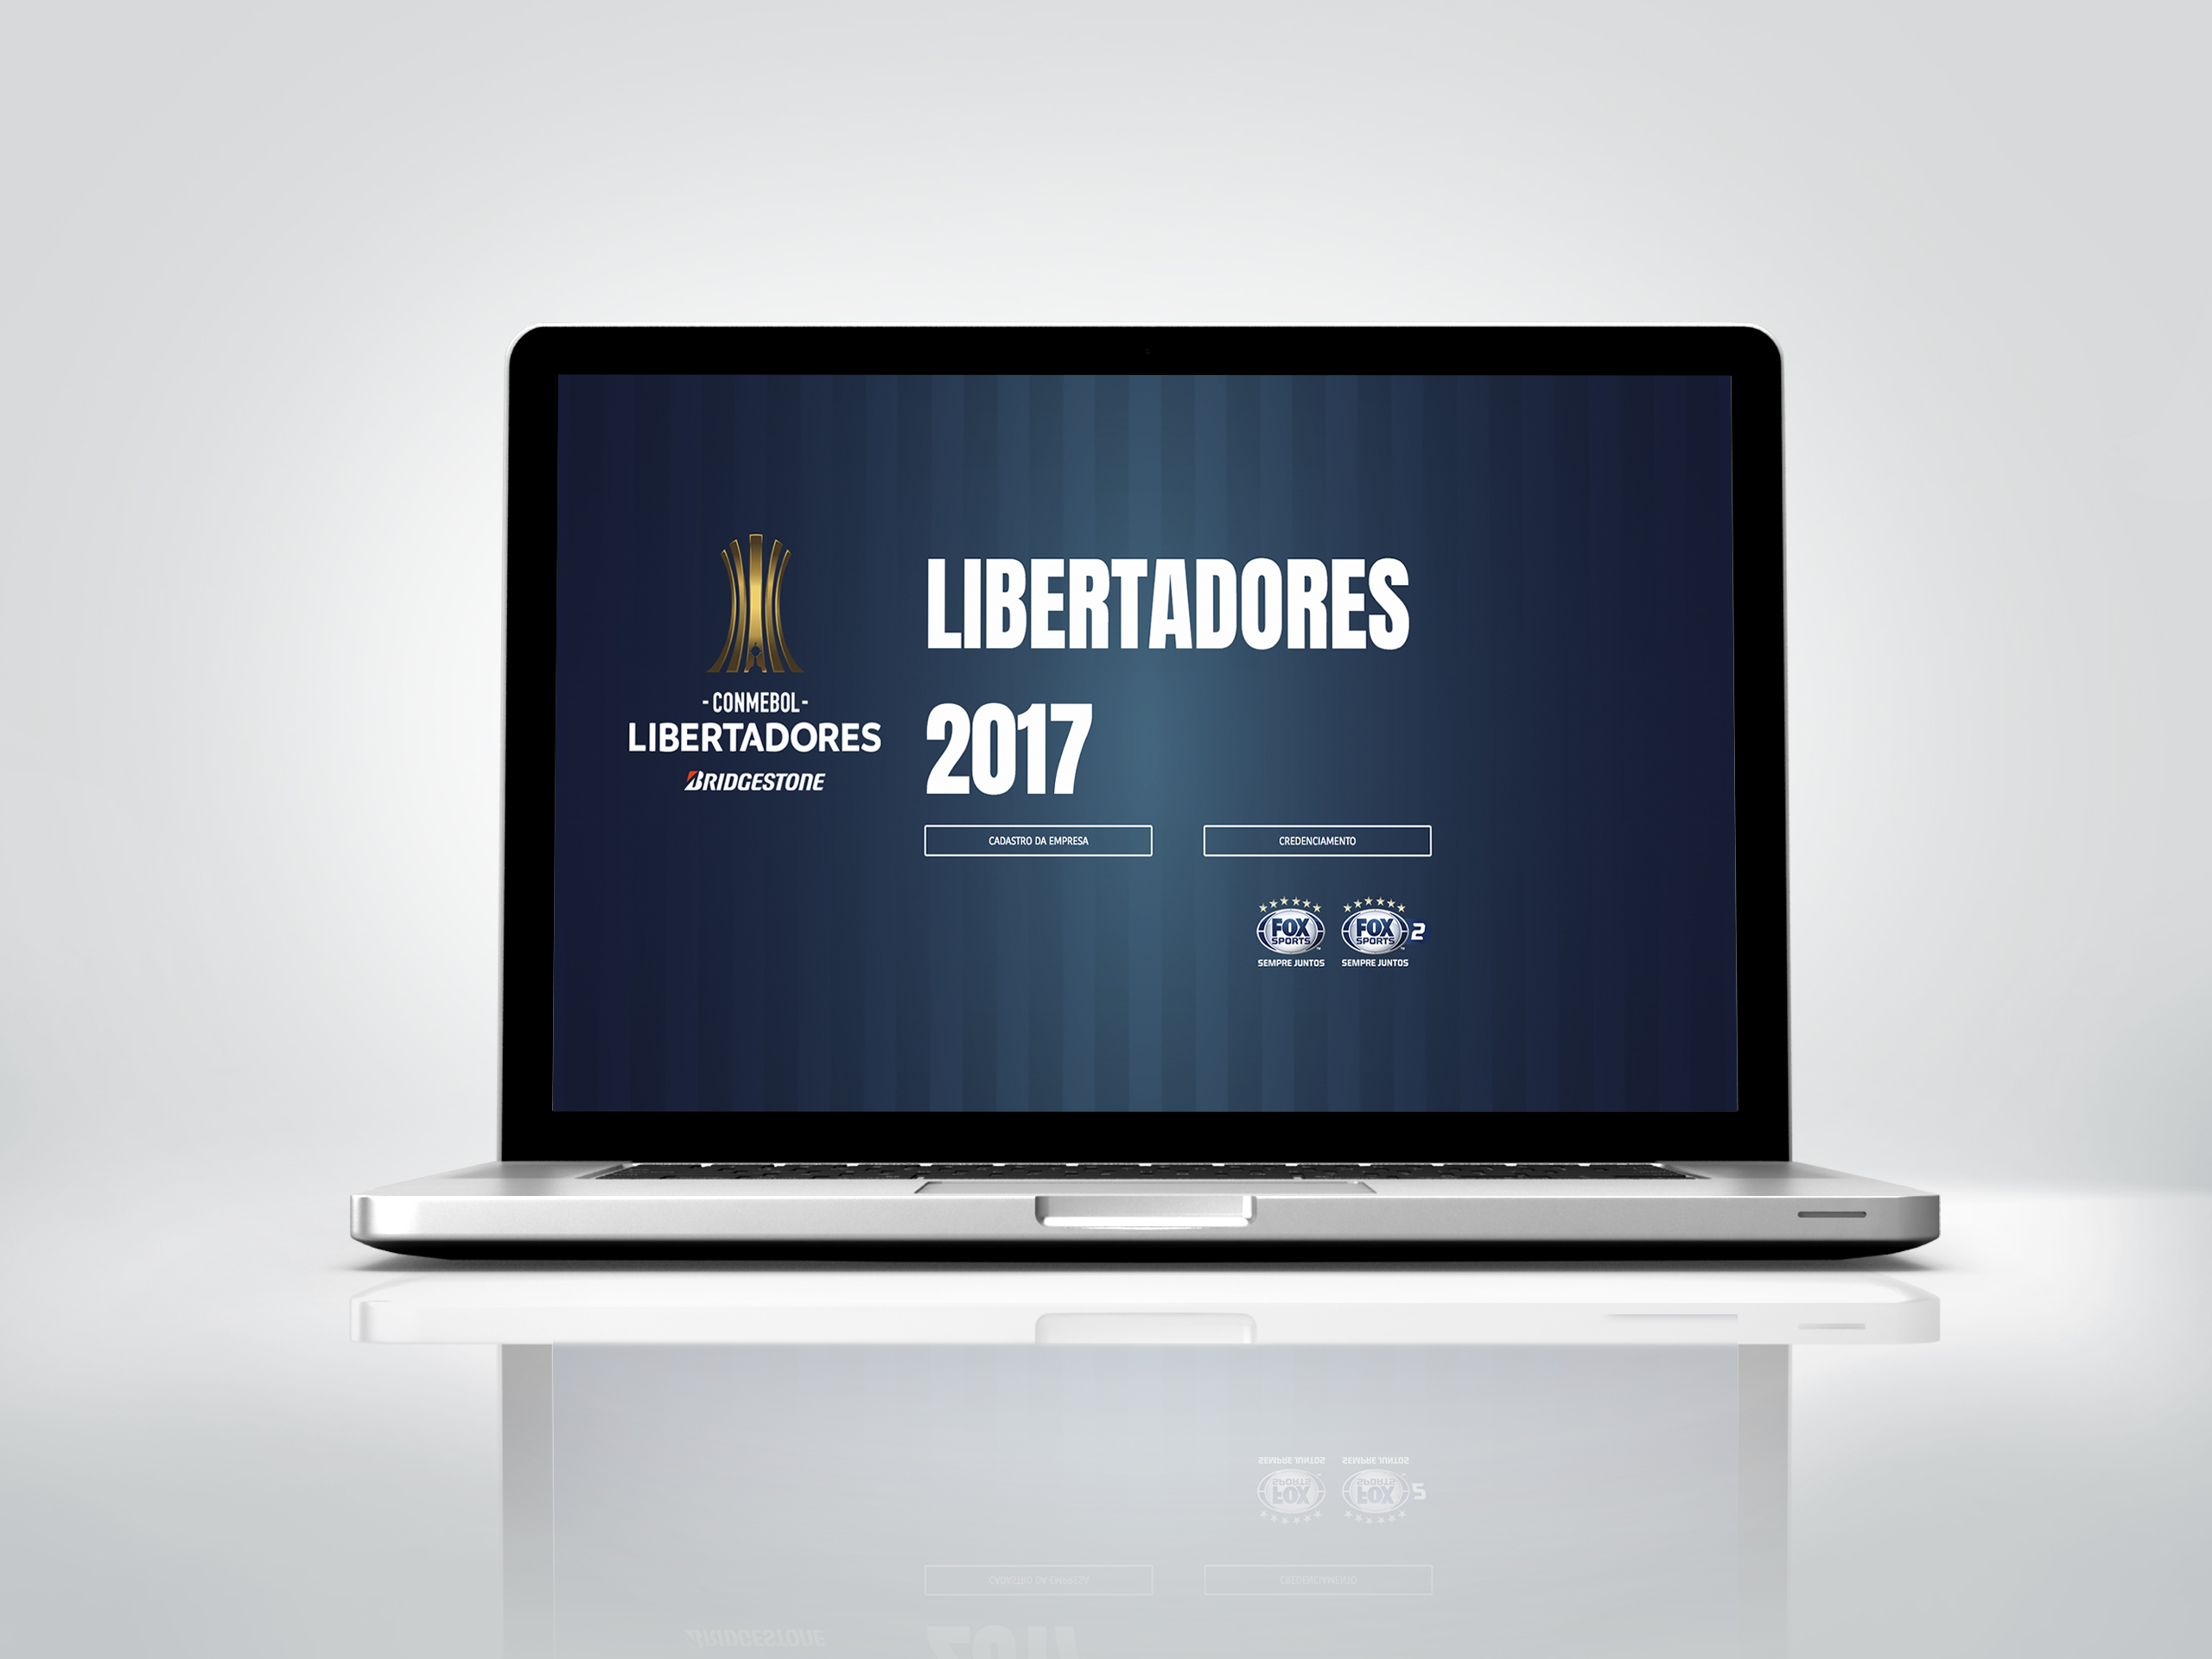 credenciamento-libertadores-site